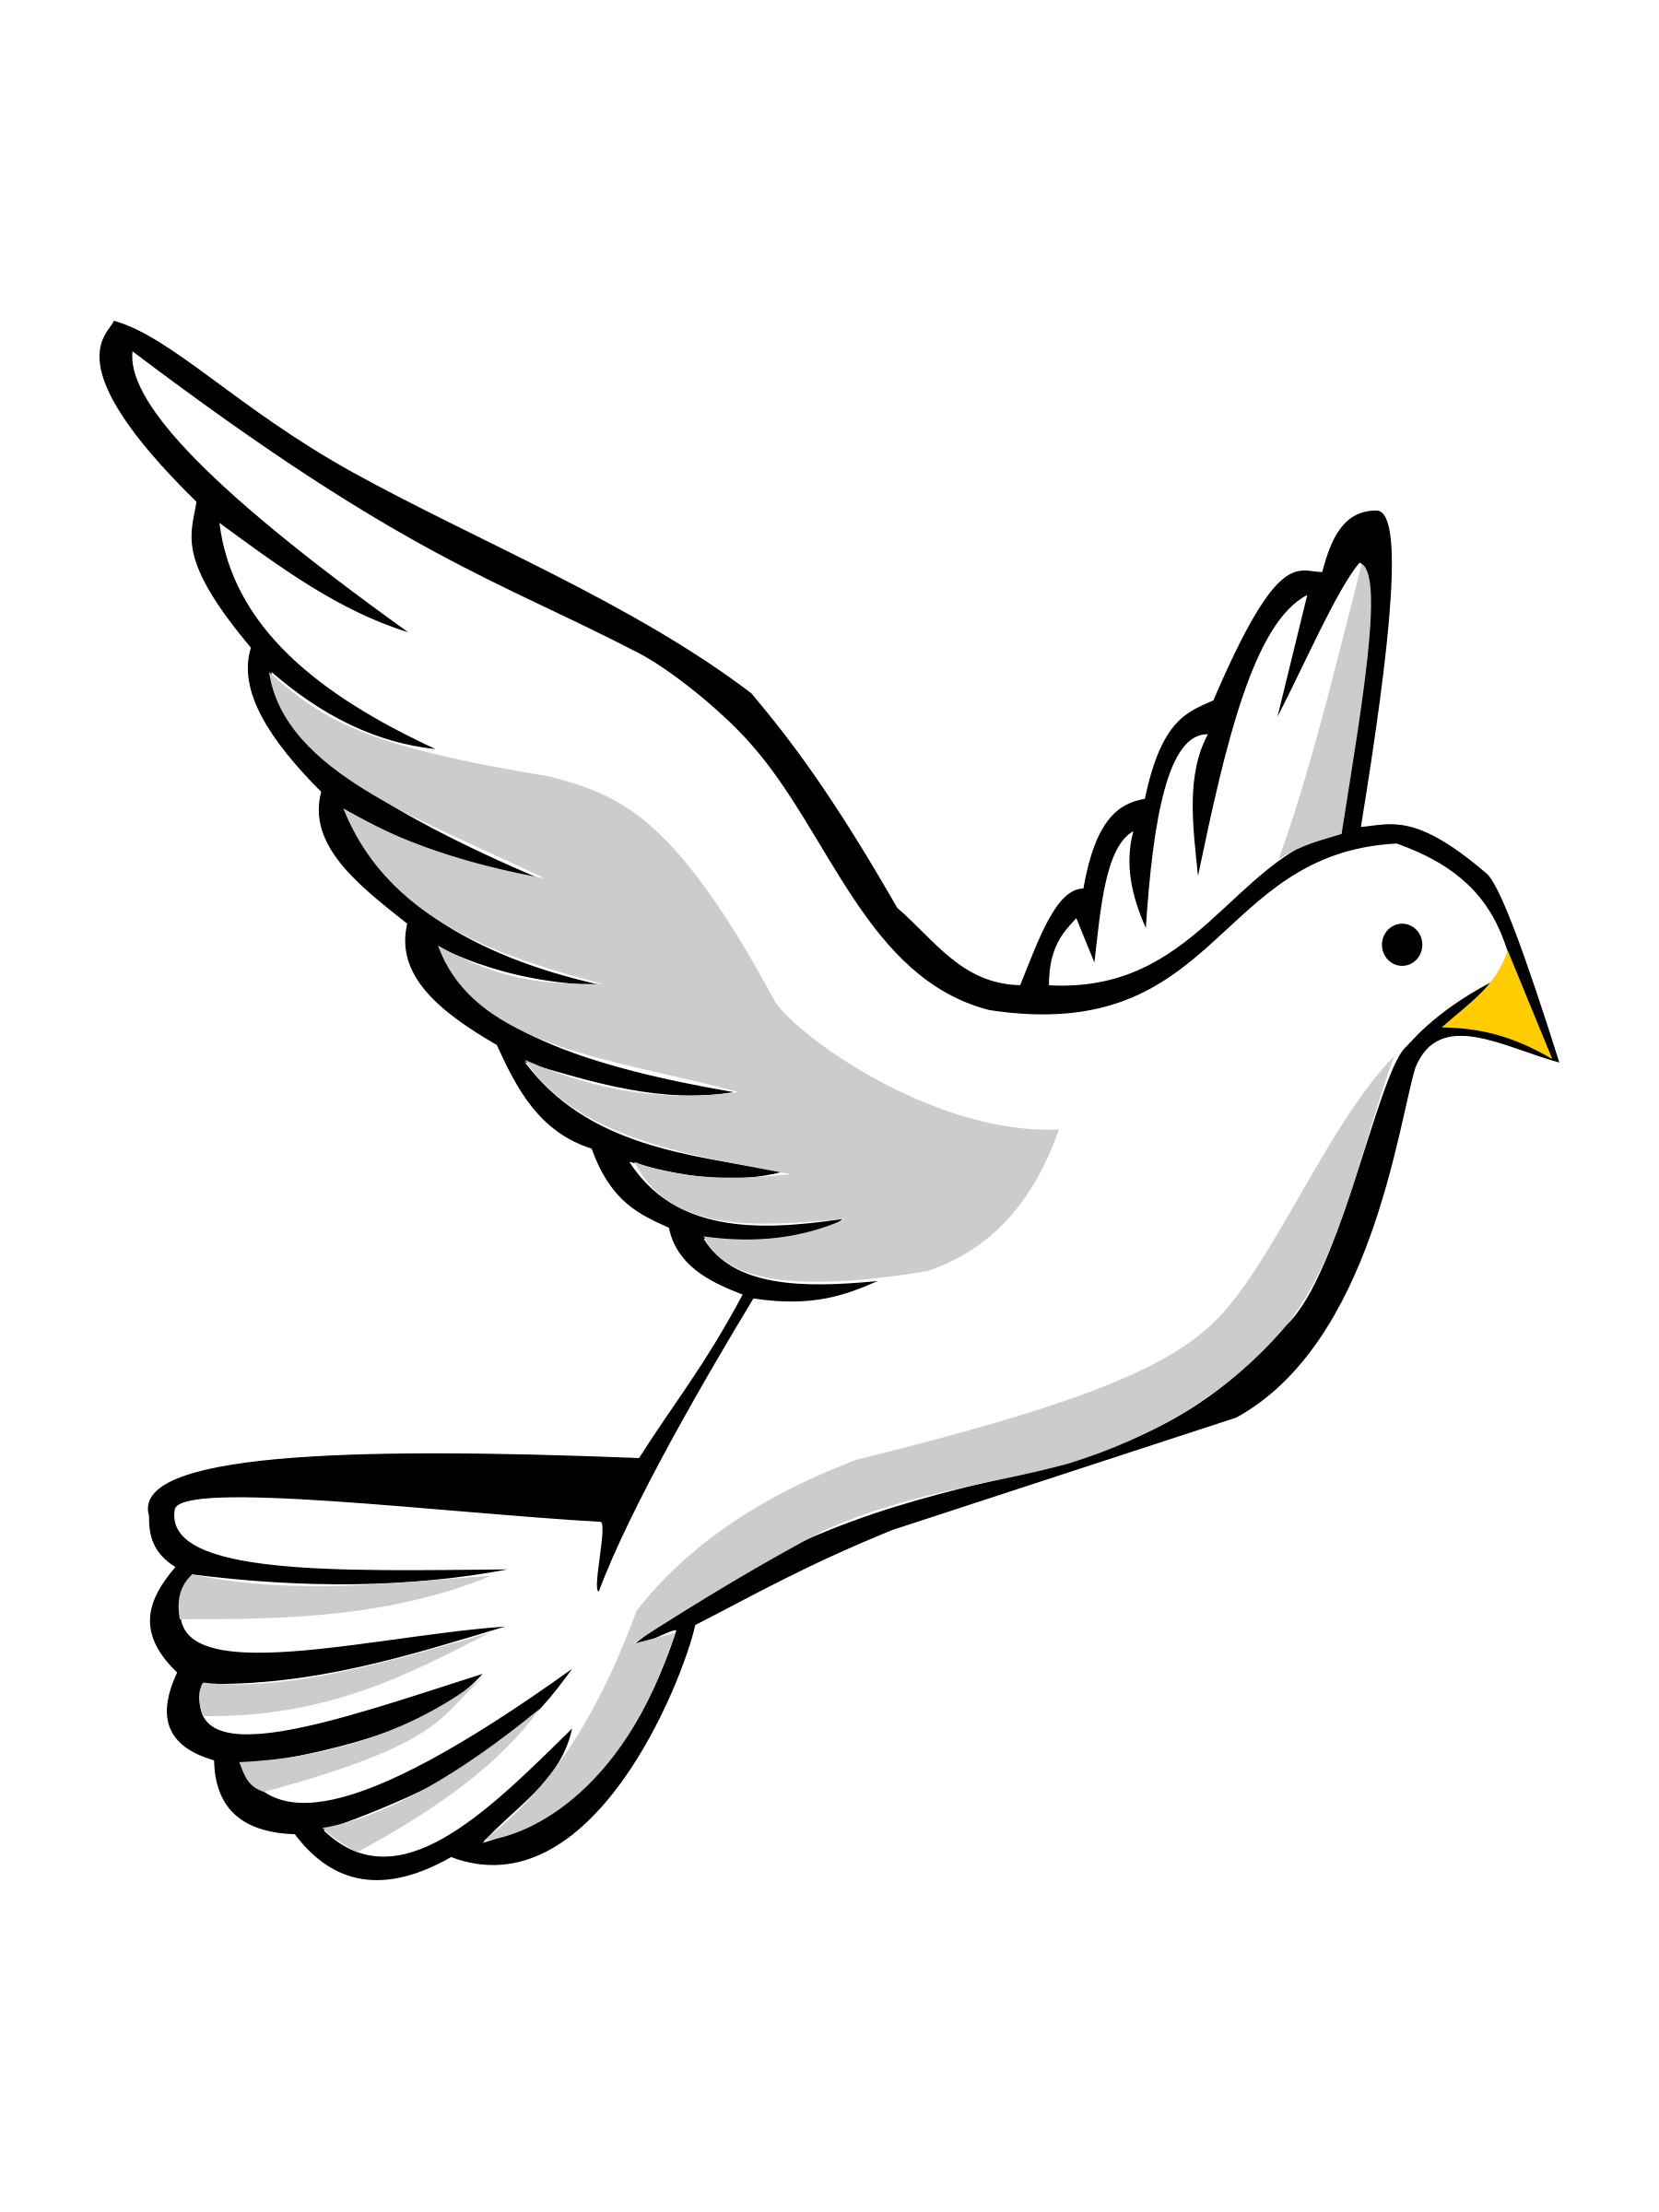 1800x2400 Beautiful Idea Dove Clip Art Holy Spirit Clipart Panda Free Images